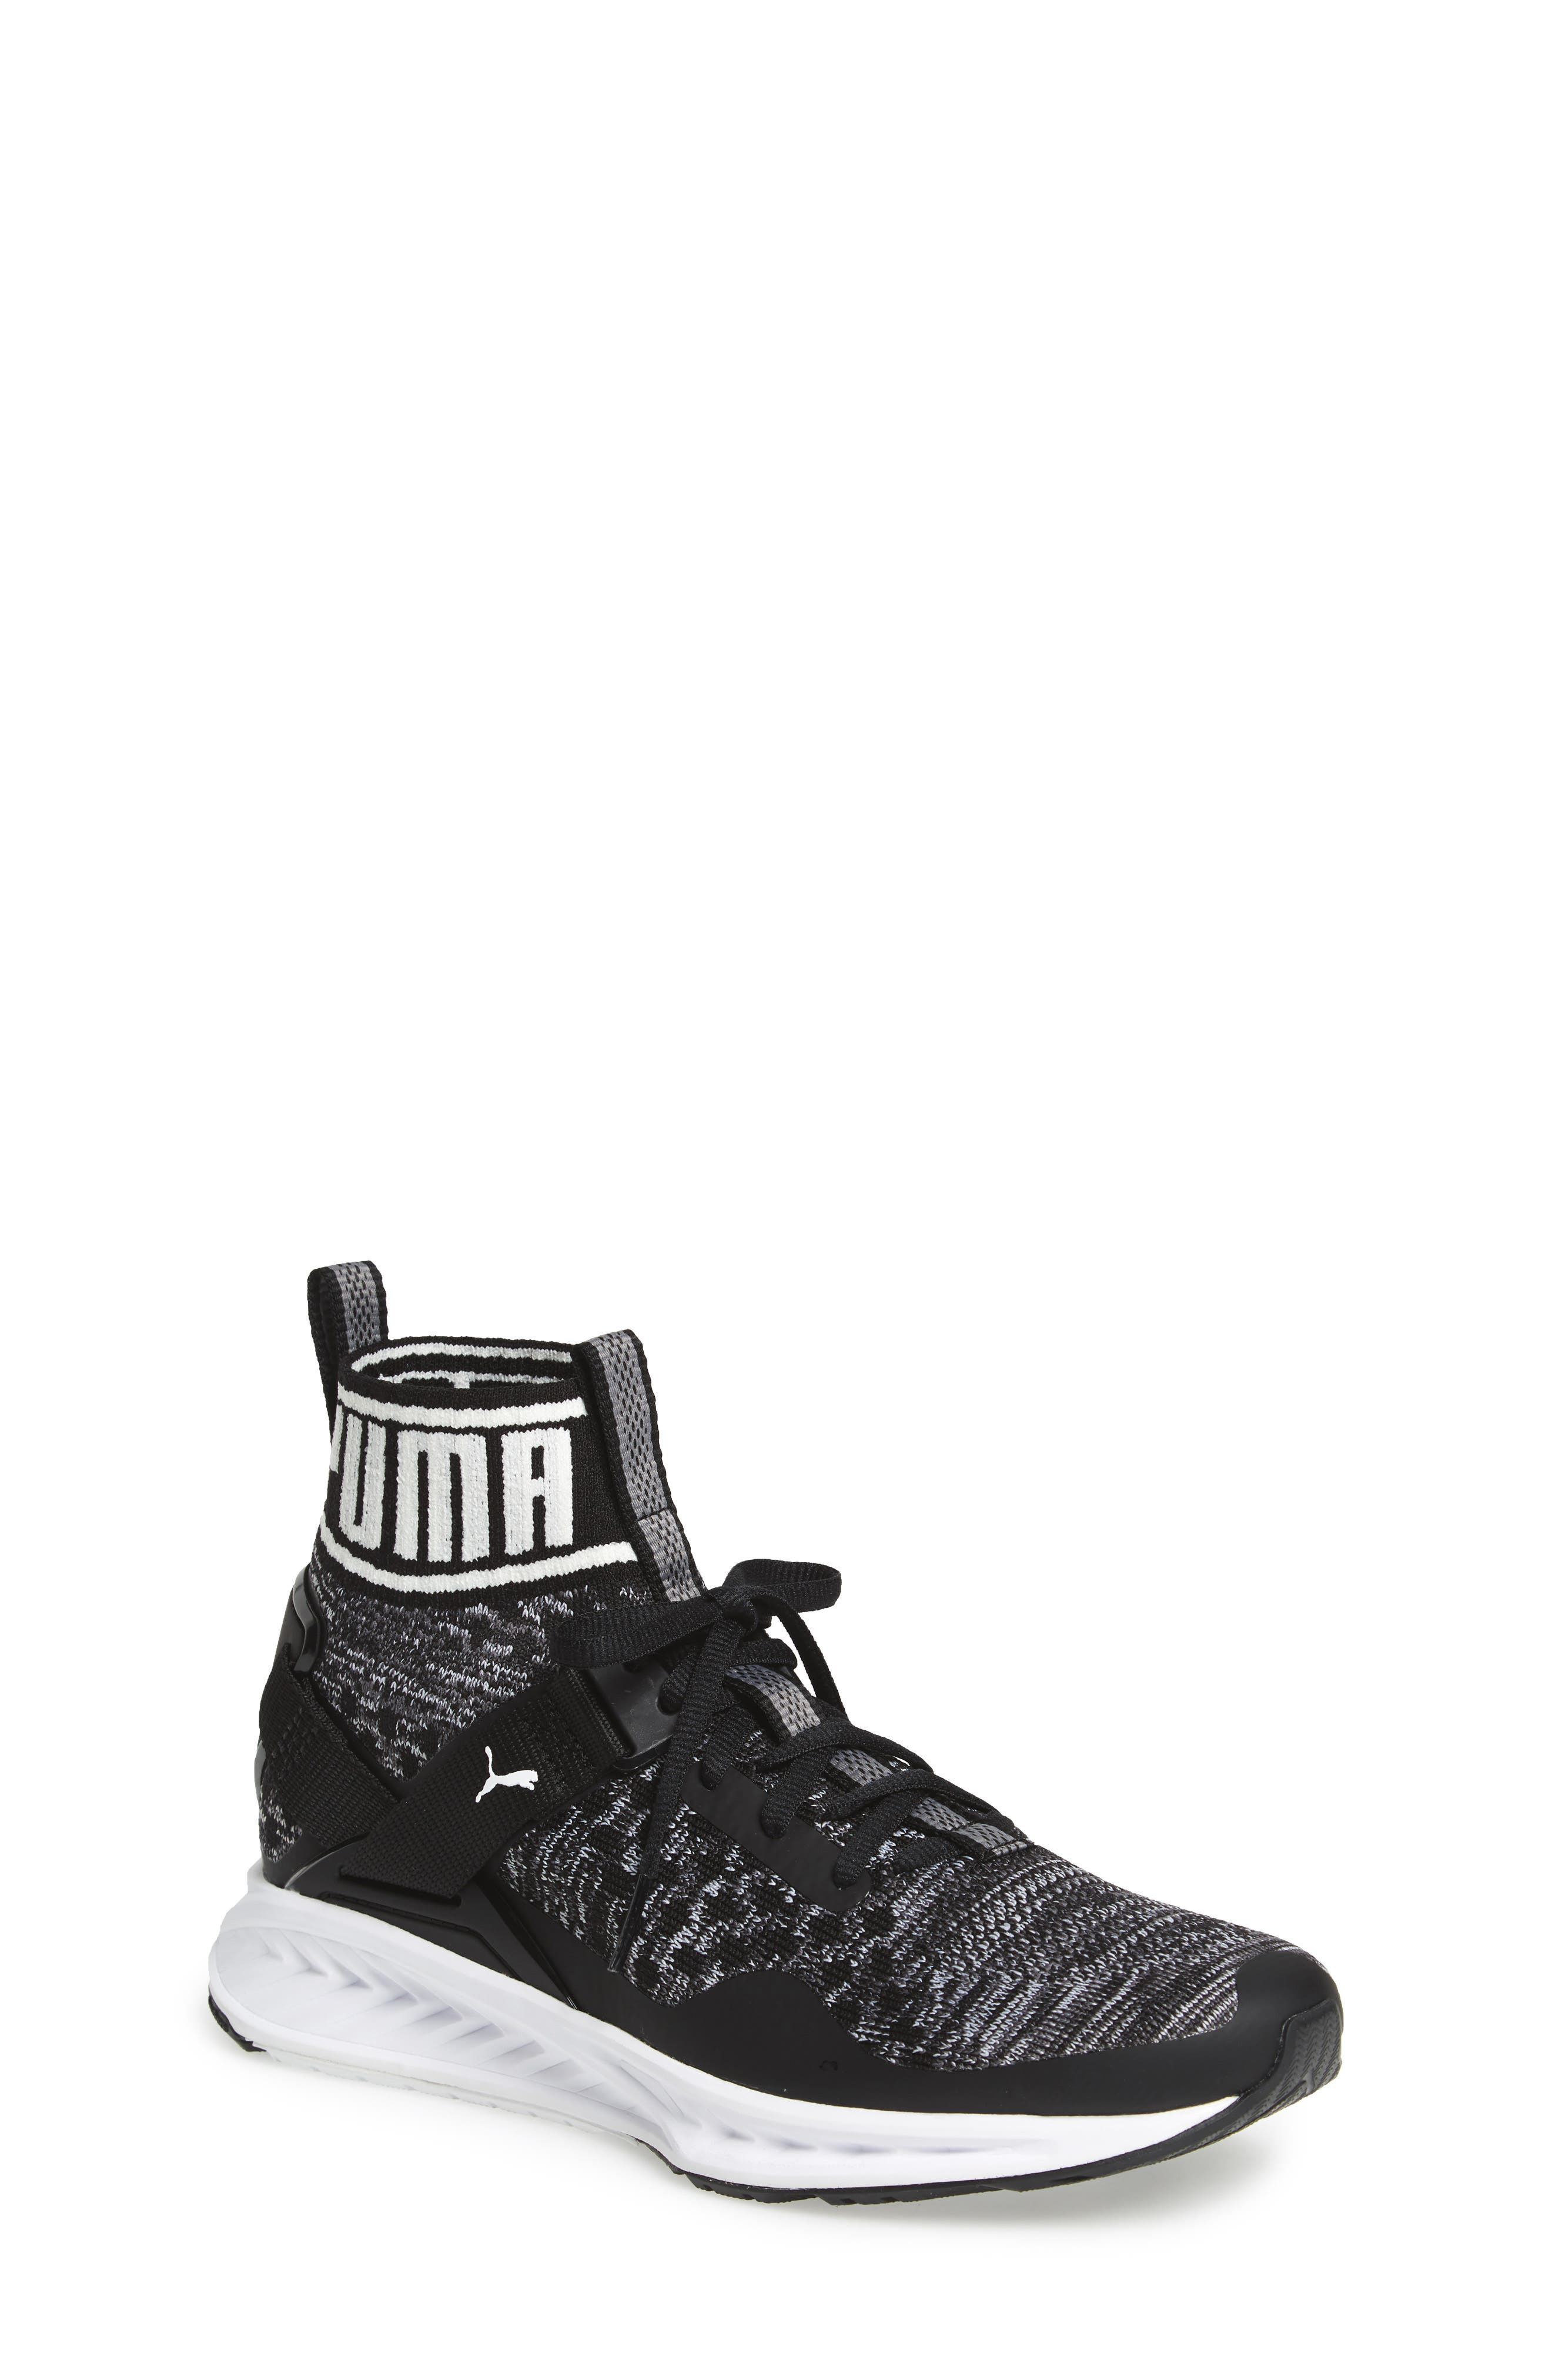 Ignite Evoknit Sneaker,                             Main thumbnail 1, color,                             001